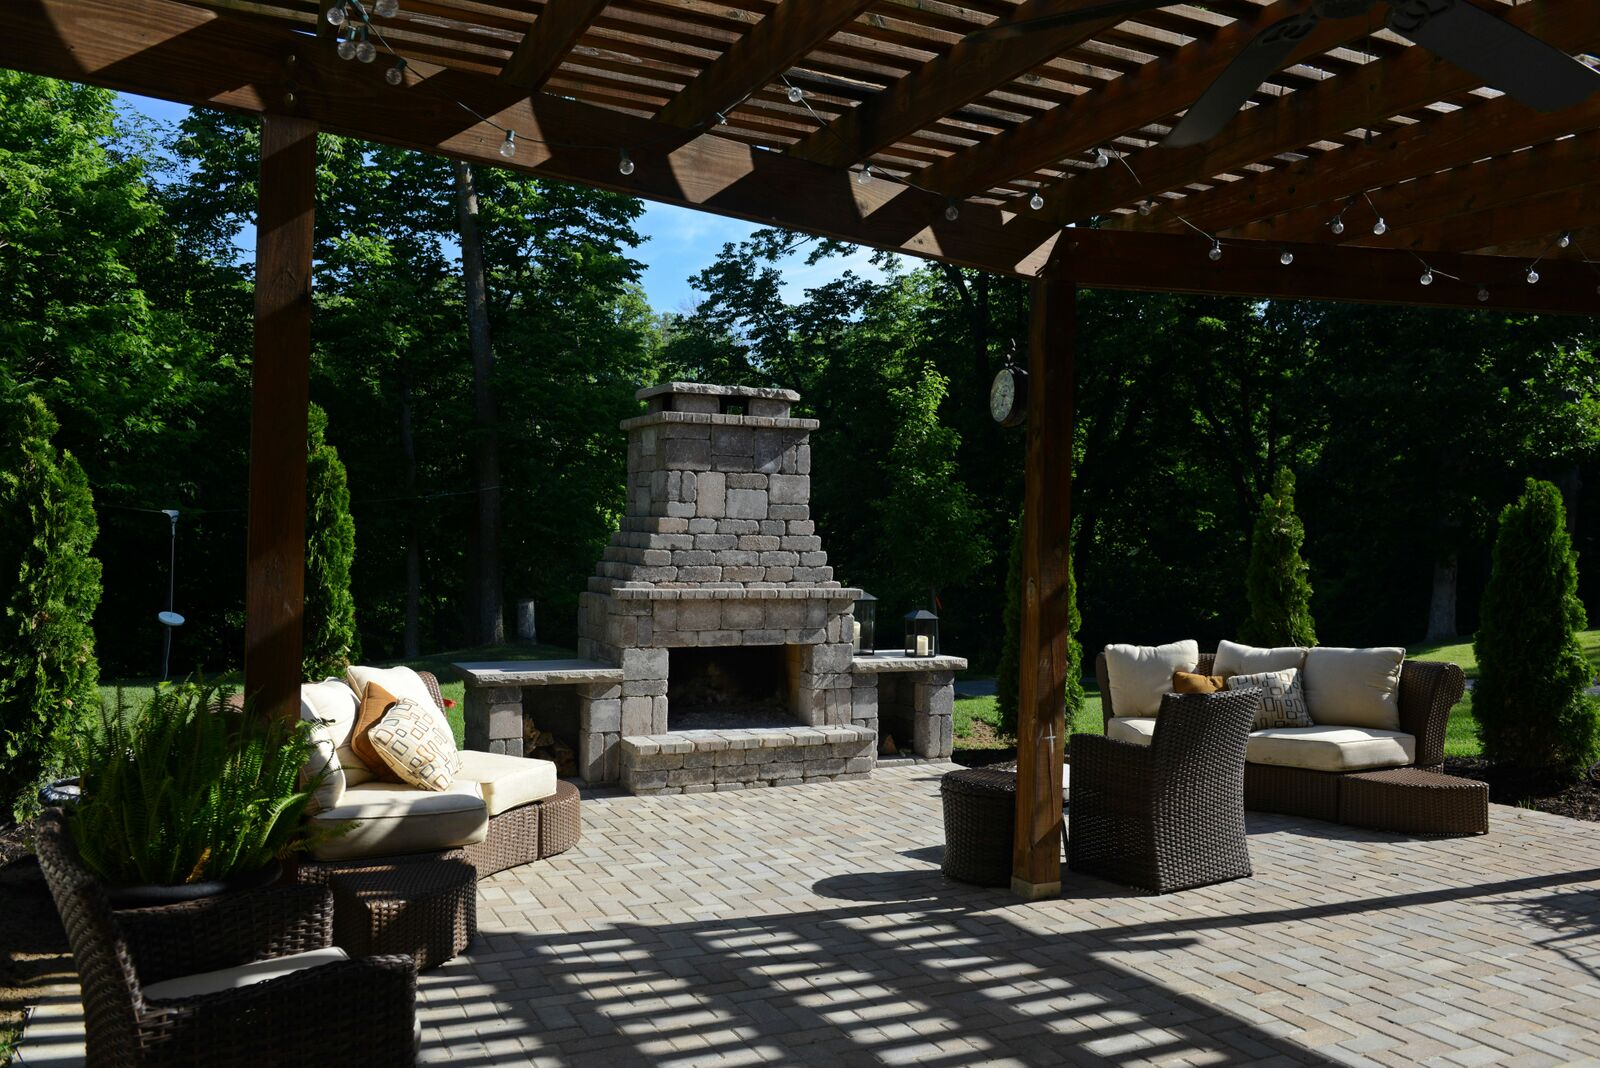 Pergola-Fireplace-Patio_preview (1).jpg